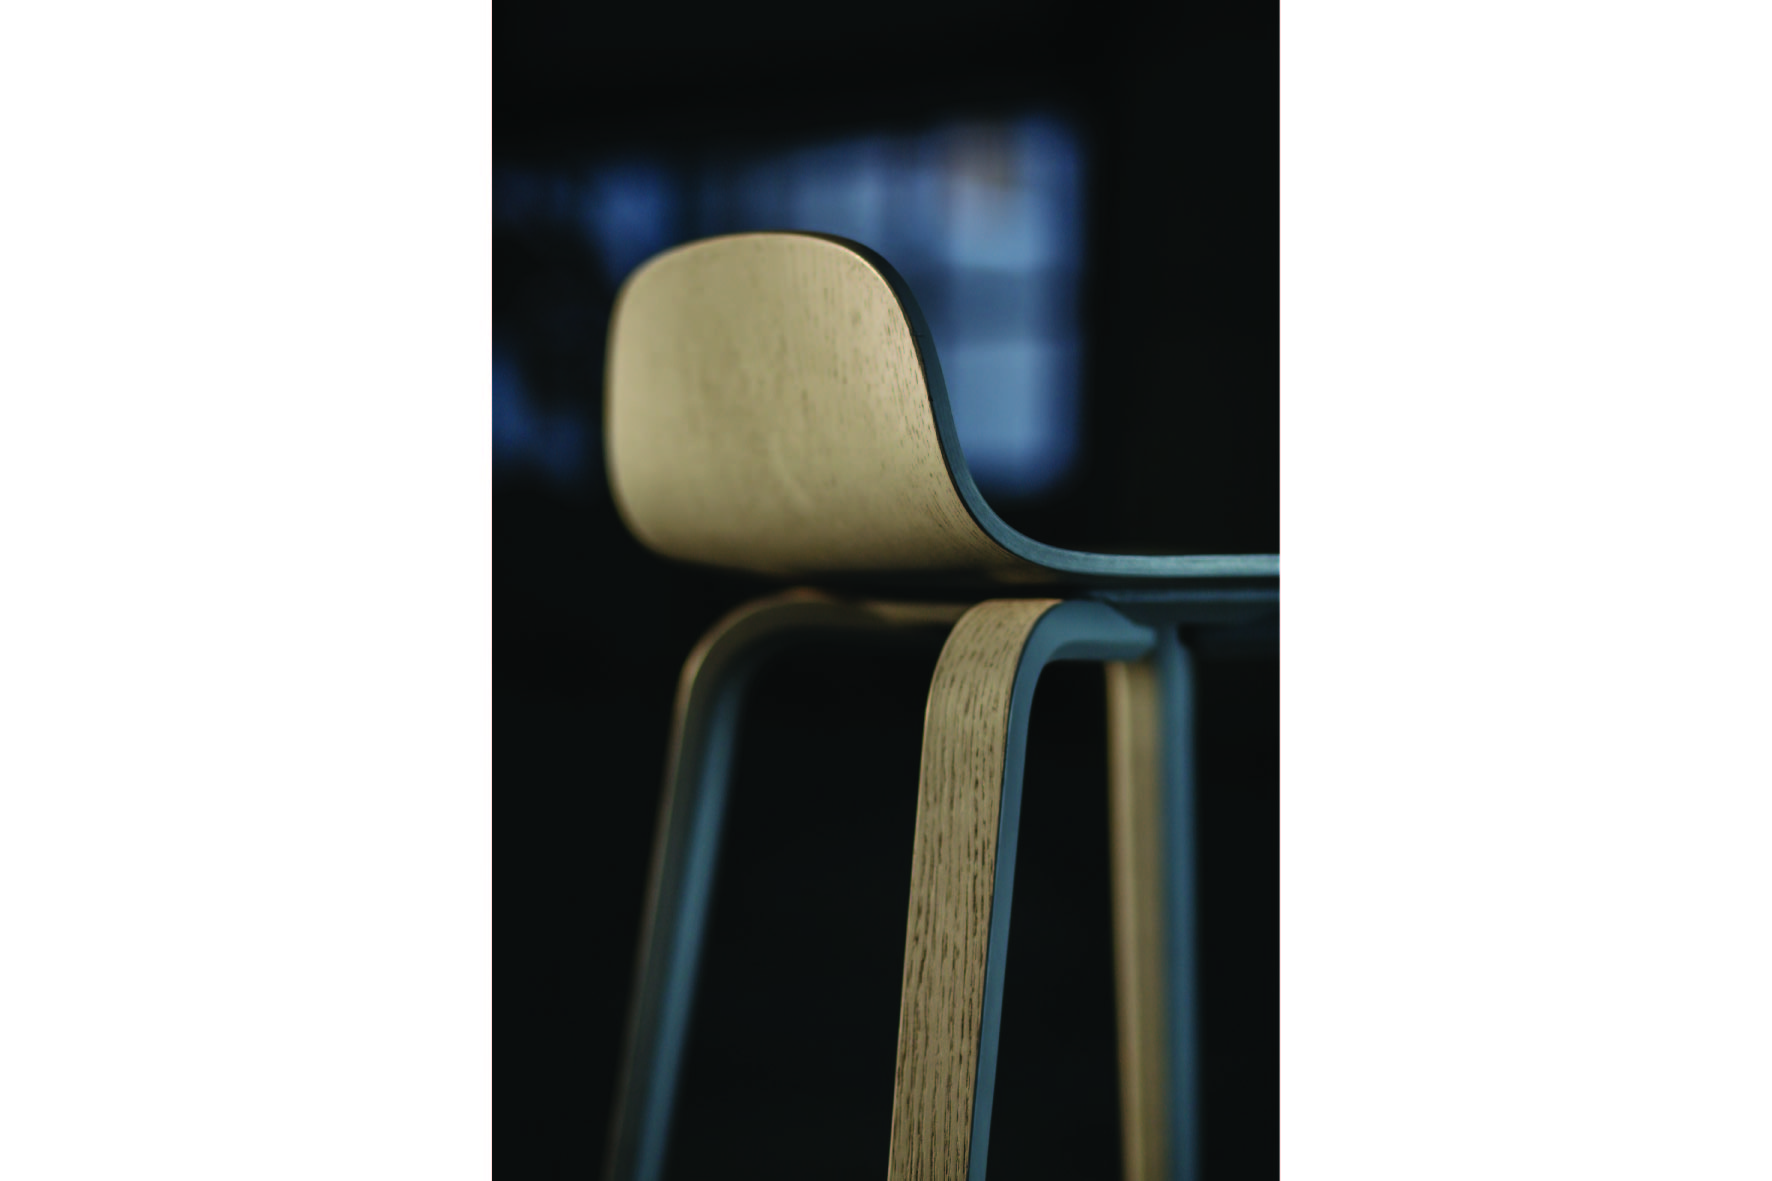 Dižozols bent wood design chairs (7)